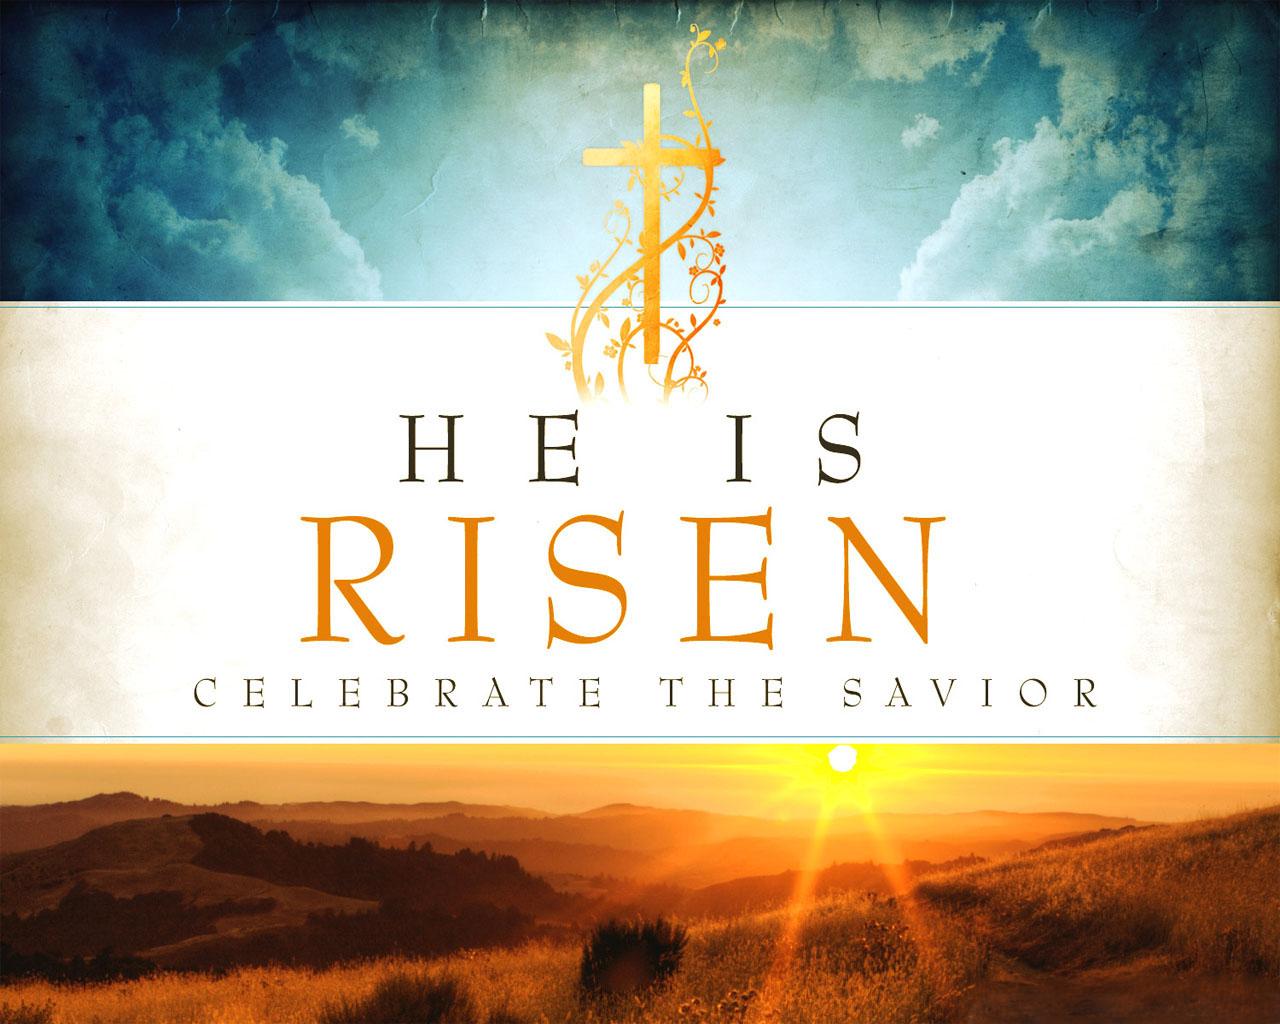 he-is-risen-easter-sunday-wallpapers-1280x1024.jpg